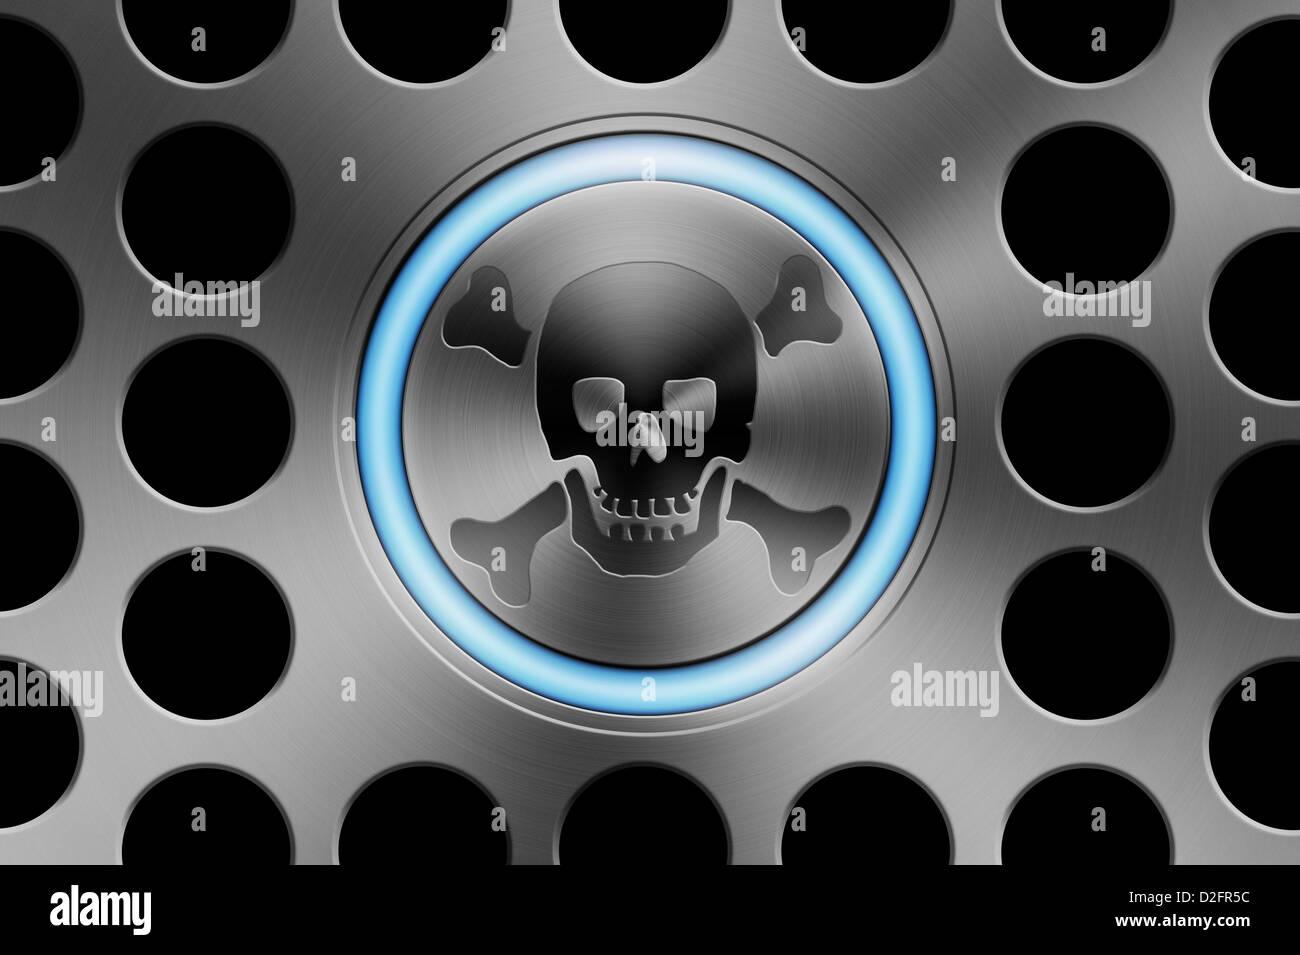 Piraterie im Internet/online Sicherheit/Cyber Security/ransomware Virus/Cyber Crime/Urheberrecht Konzept Stockbild